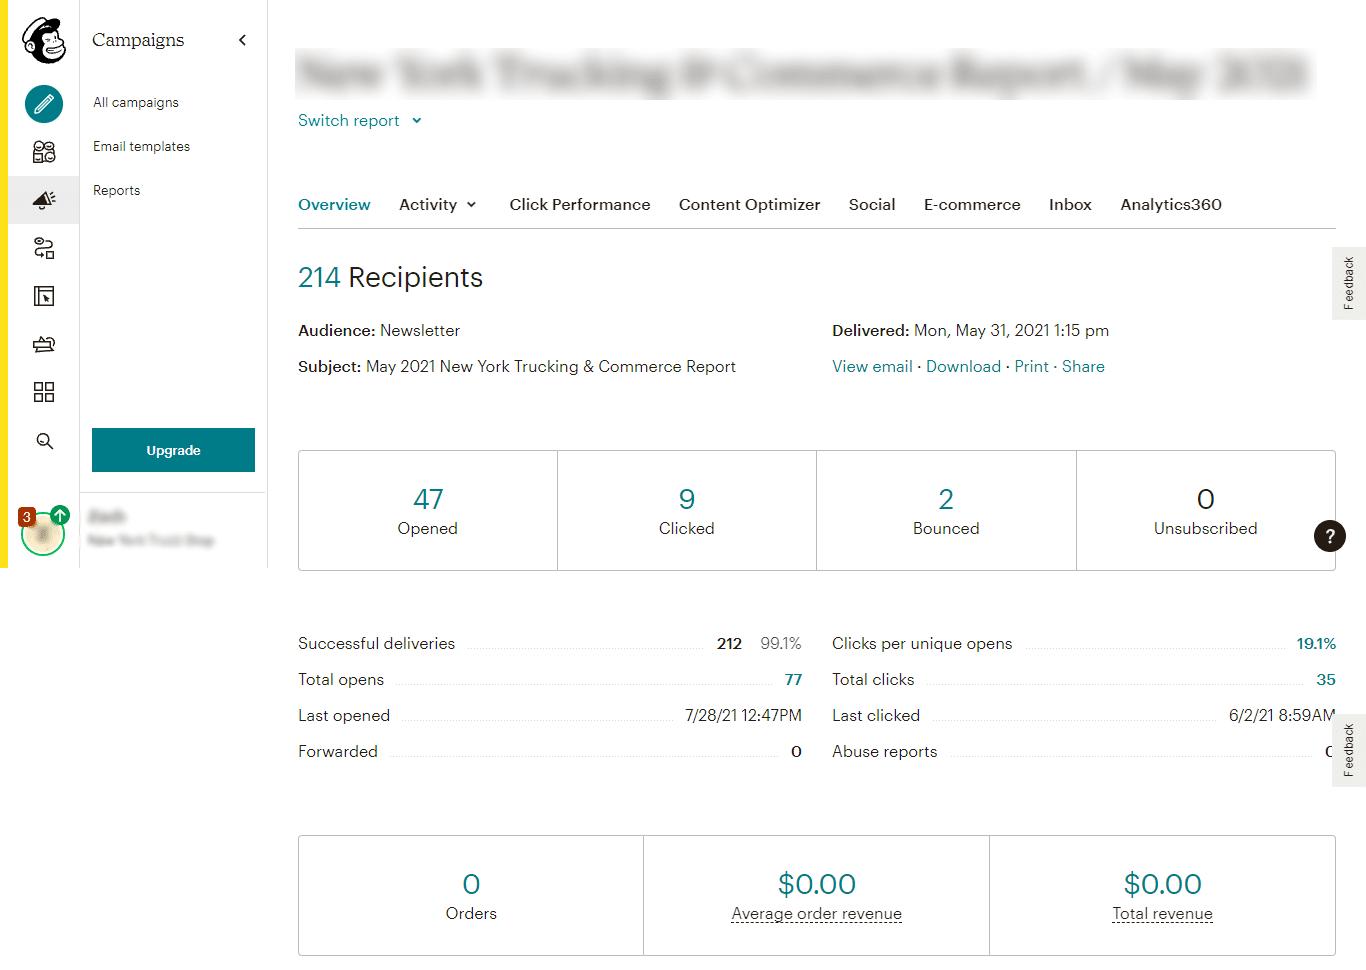 Mailchimp Reporting and Analytics 3